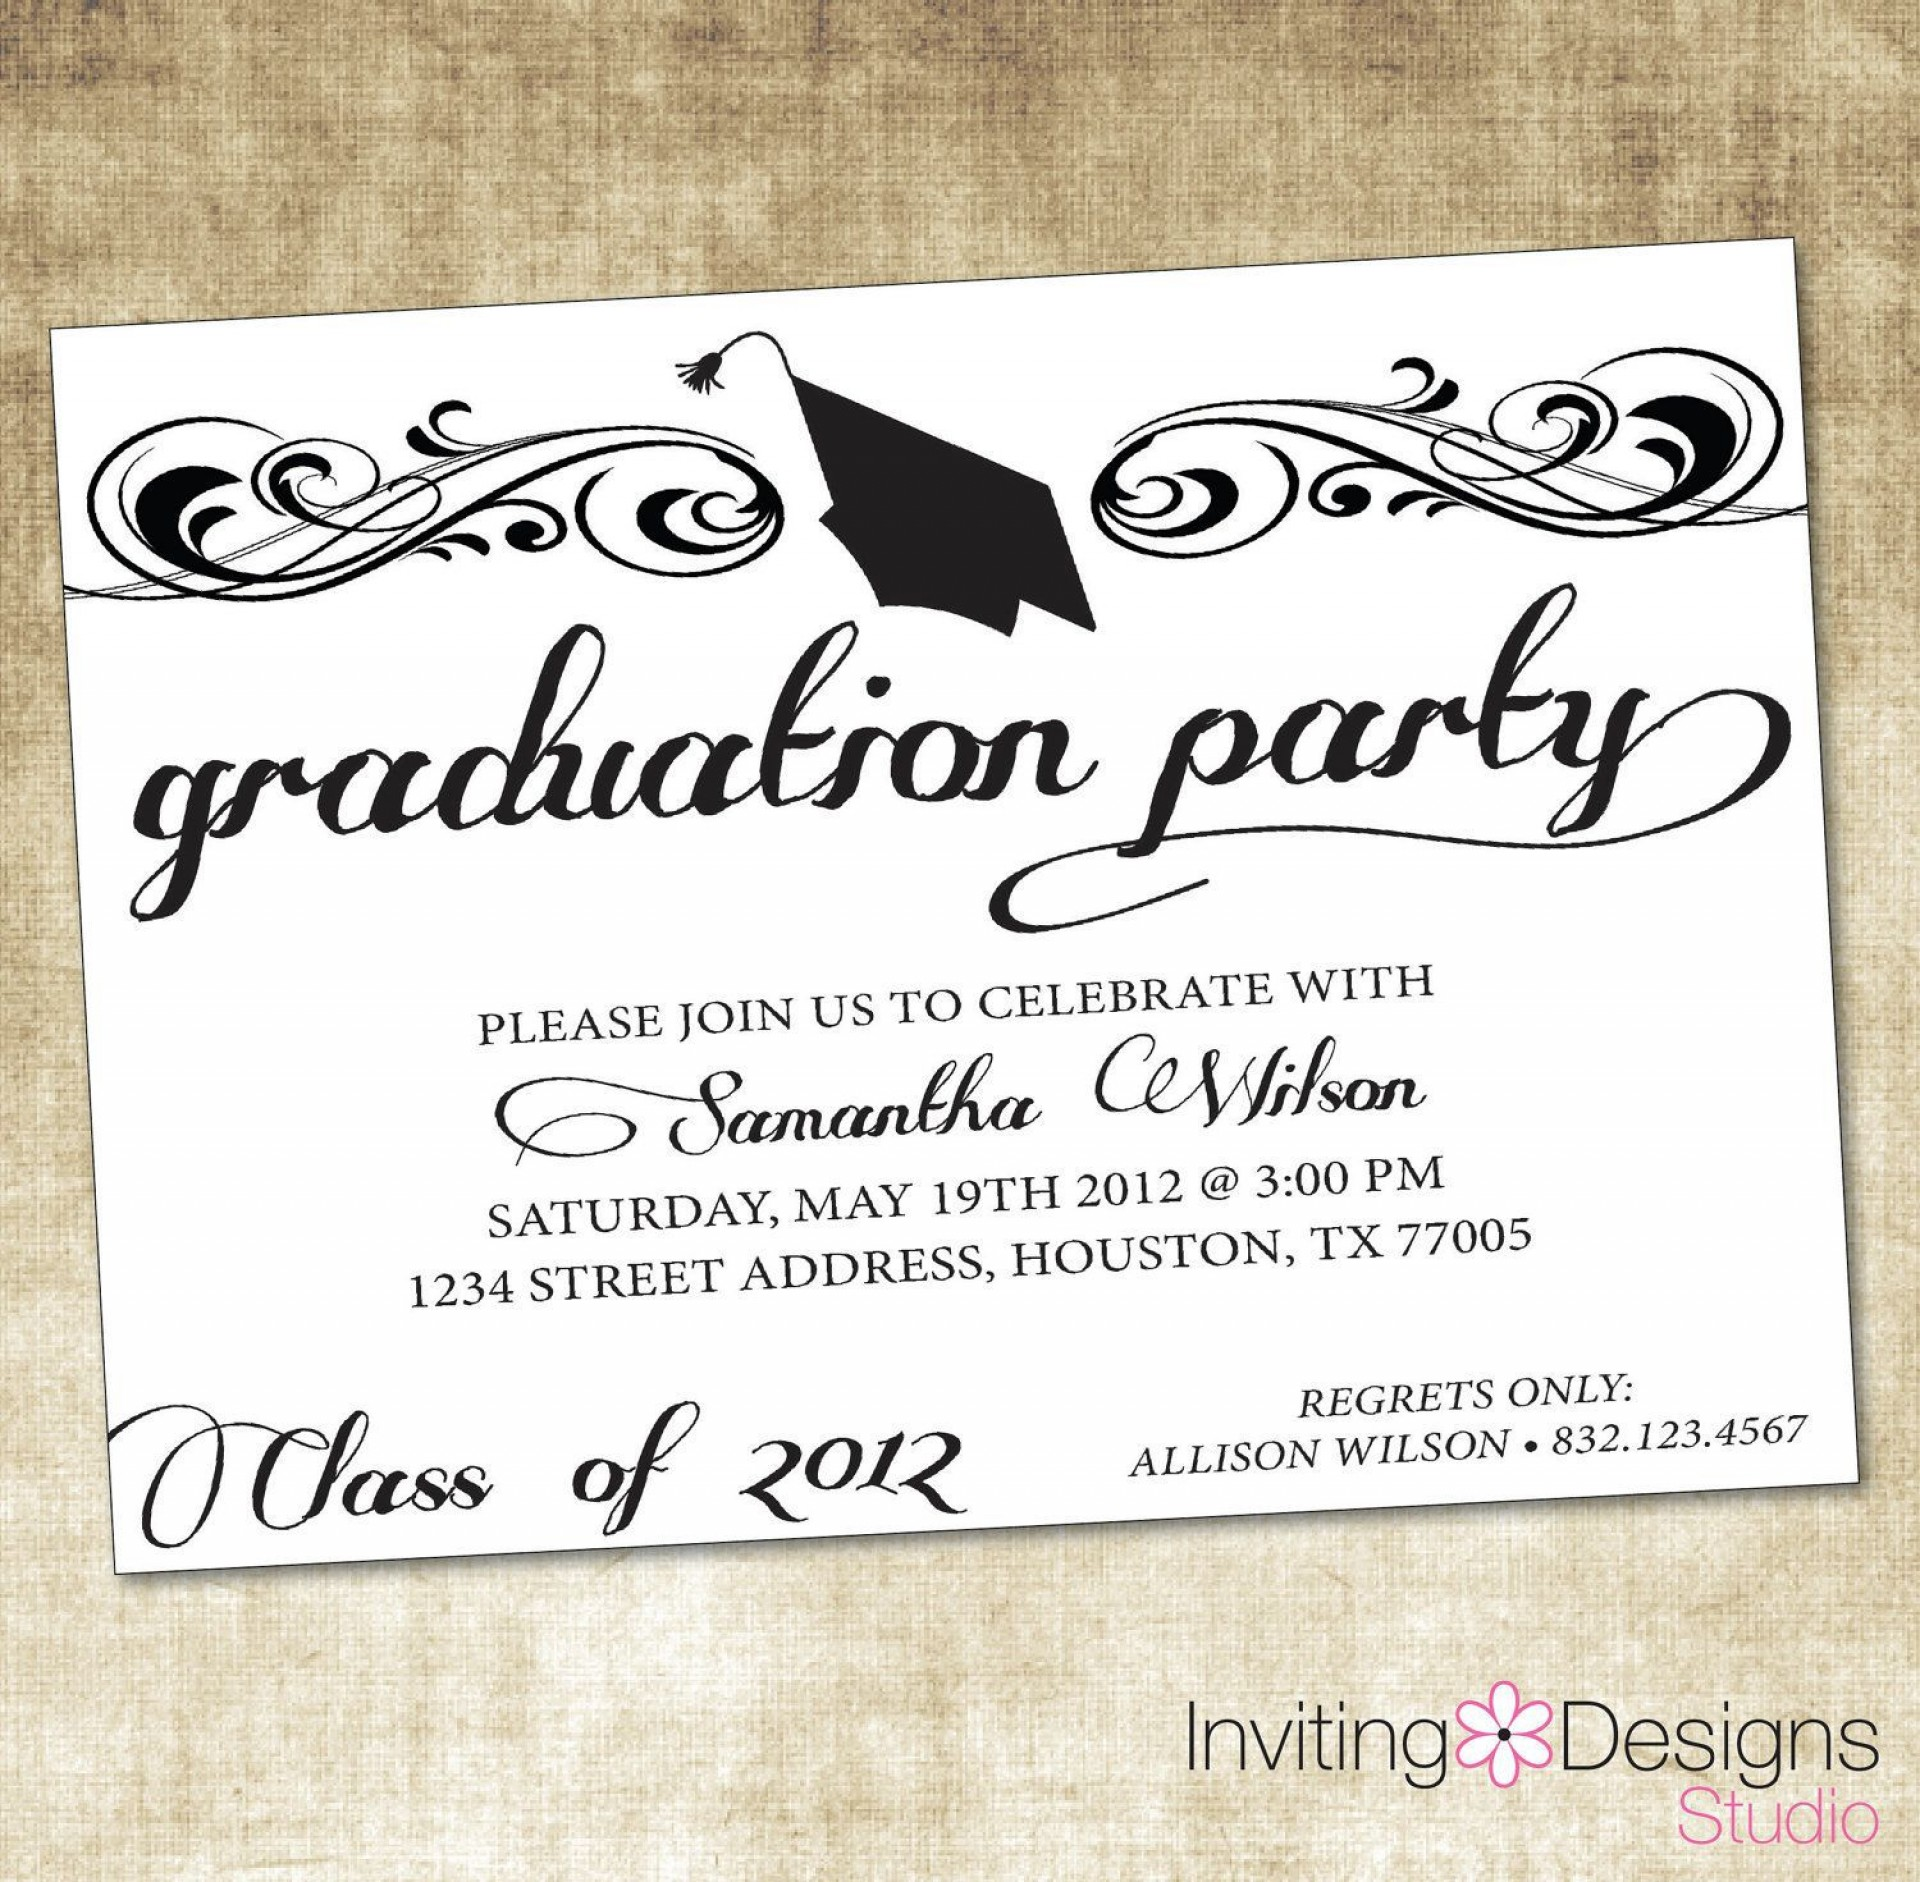 000 Shocking College Graduation Party Invitation Template Photo  Templates1920